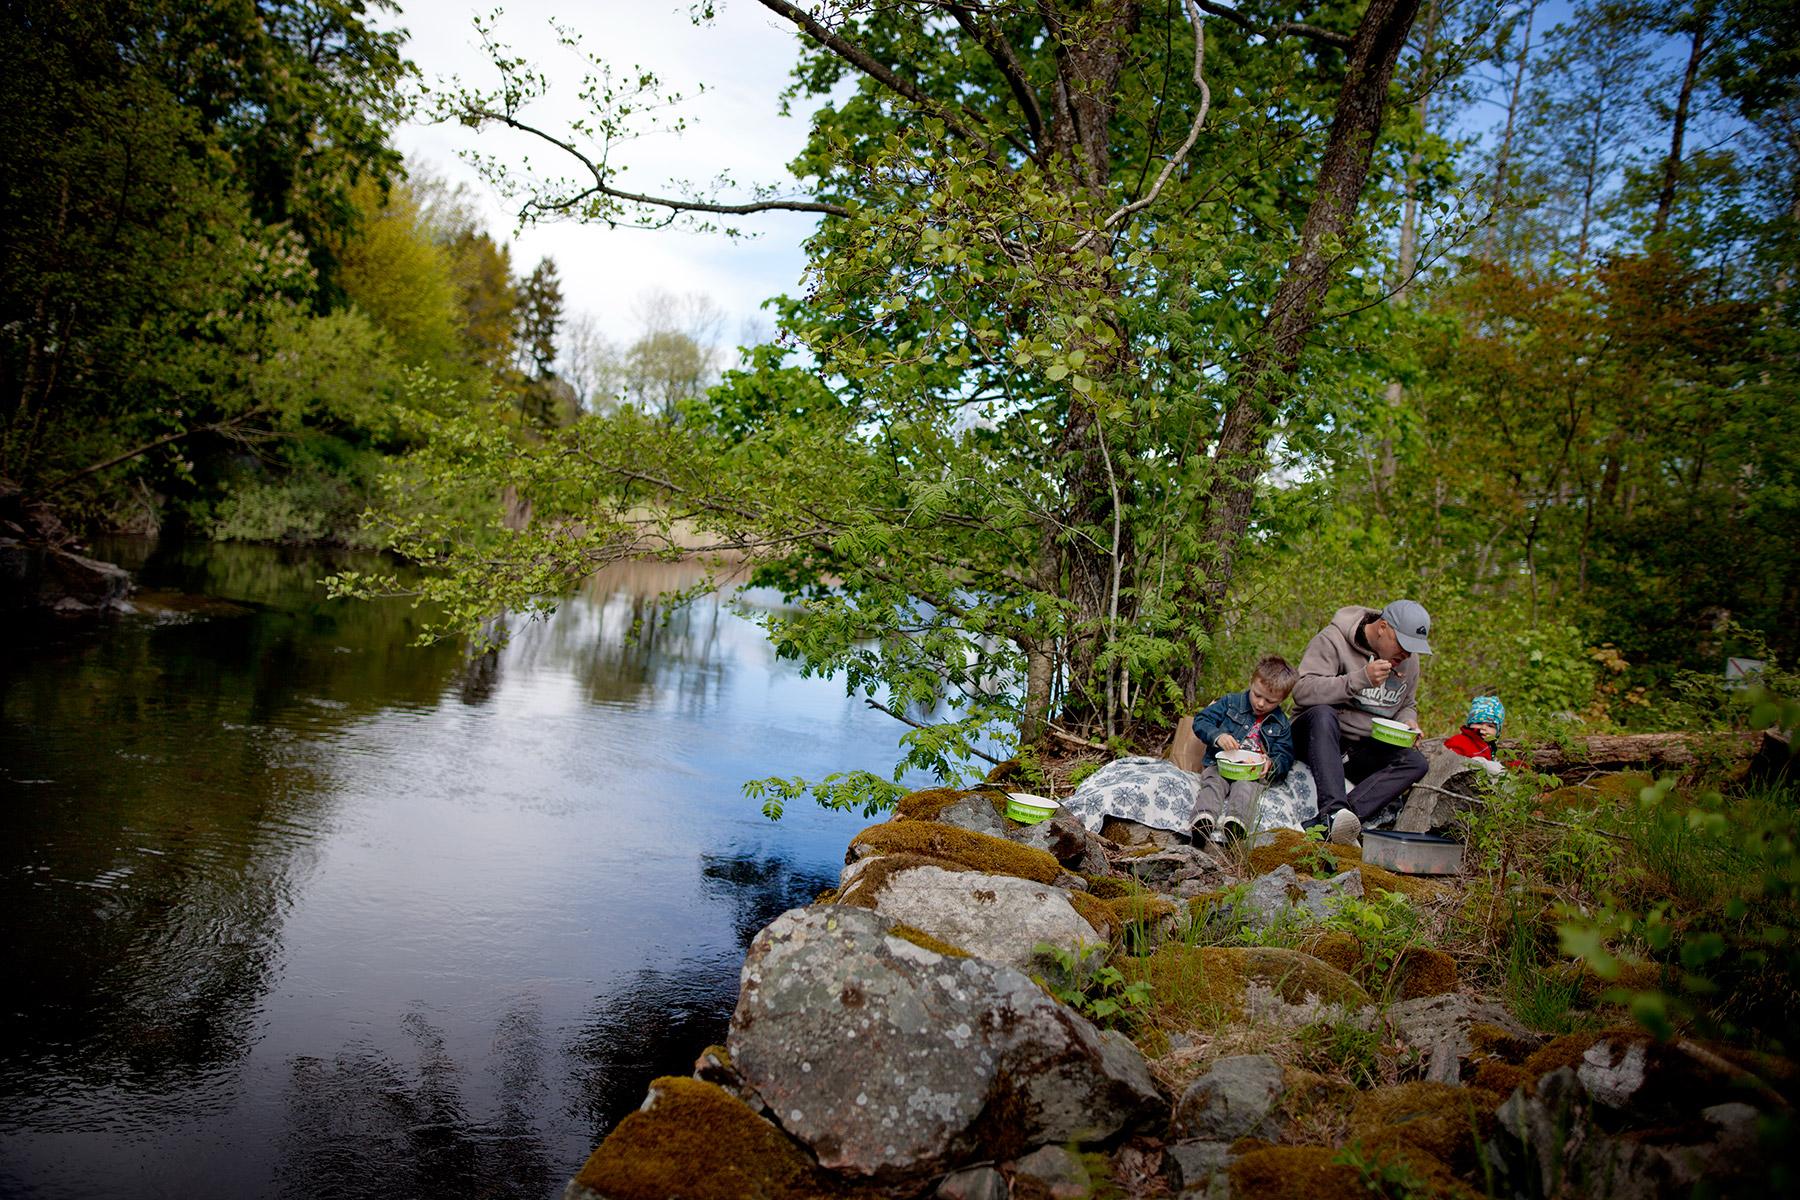 blogg-150525gasevadsholm3.jpg